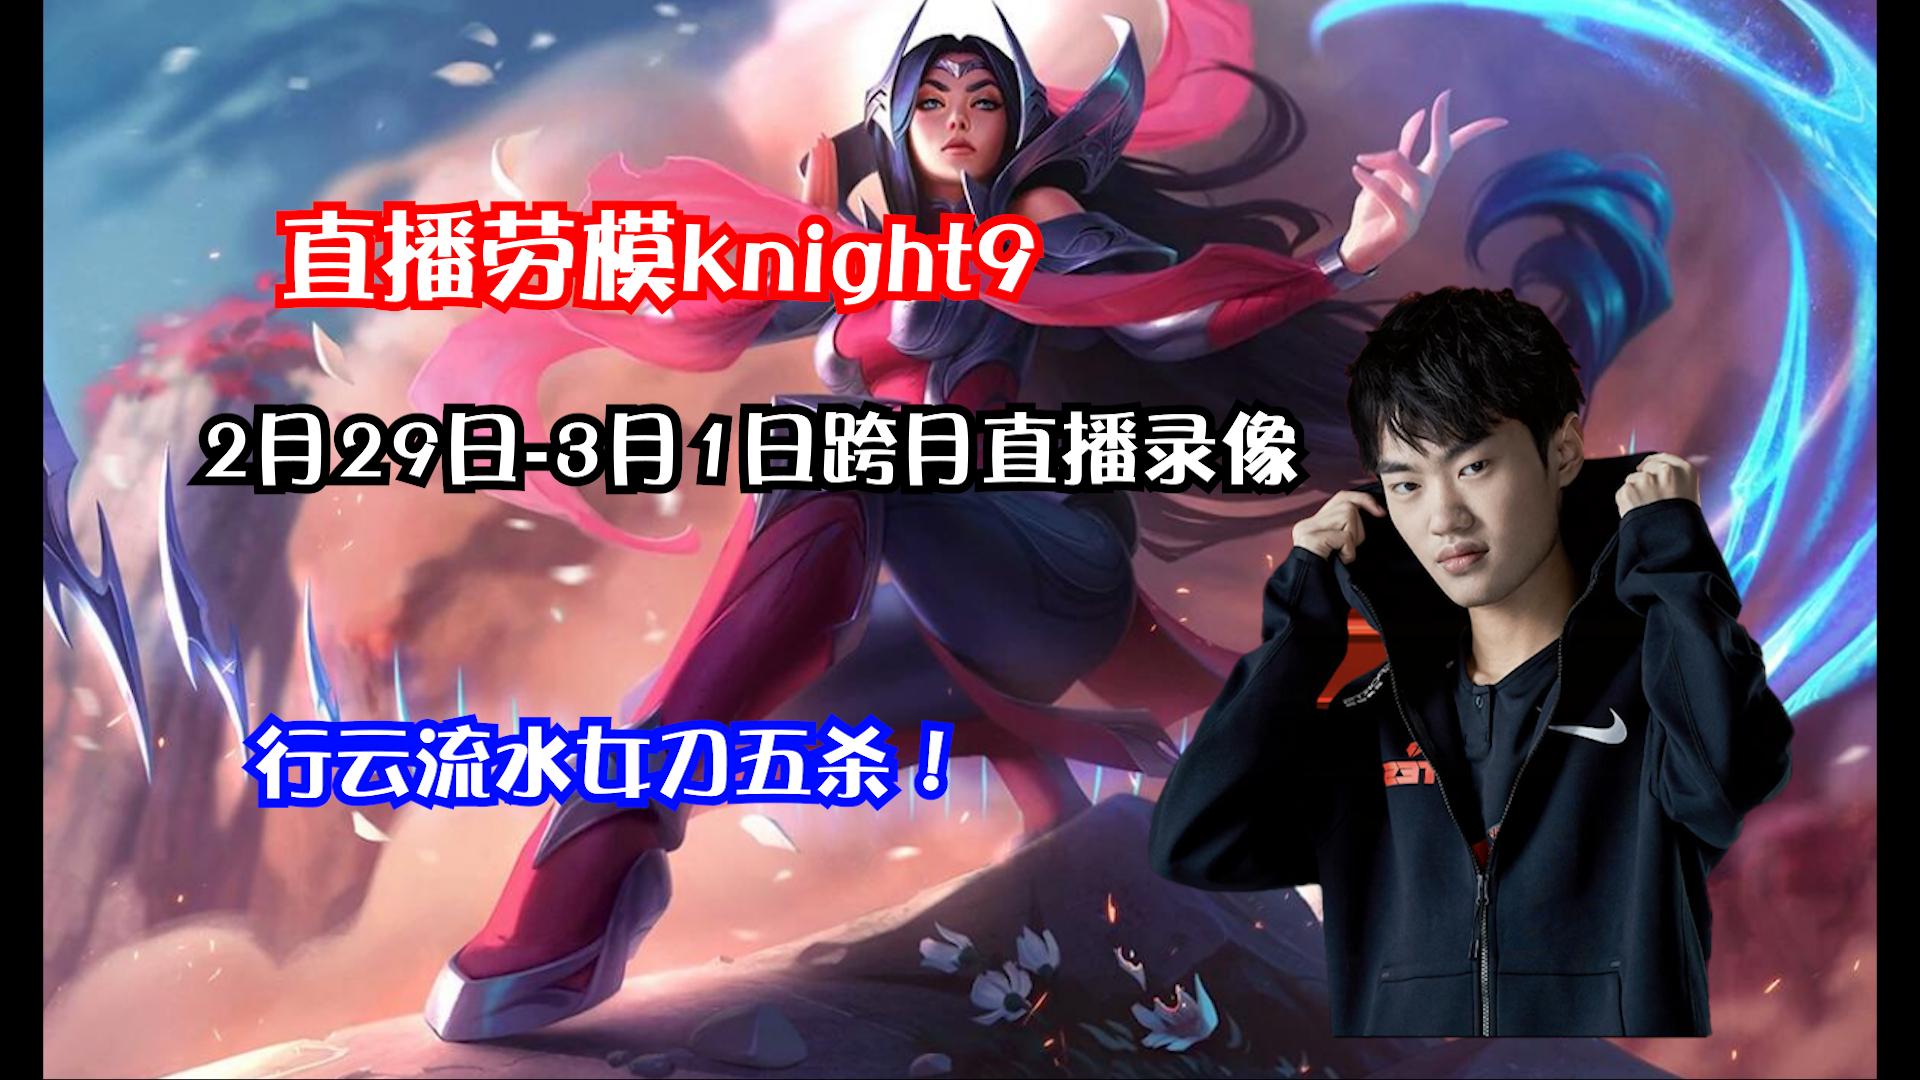 【knight9】跨月直播劳模2020-2-29到3-1号直播录像